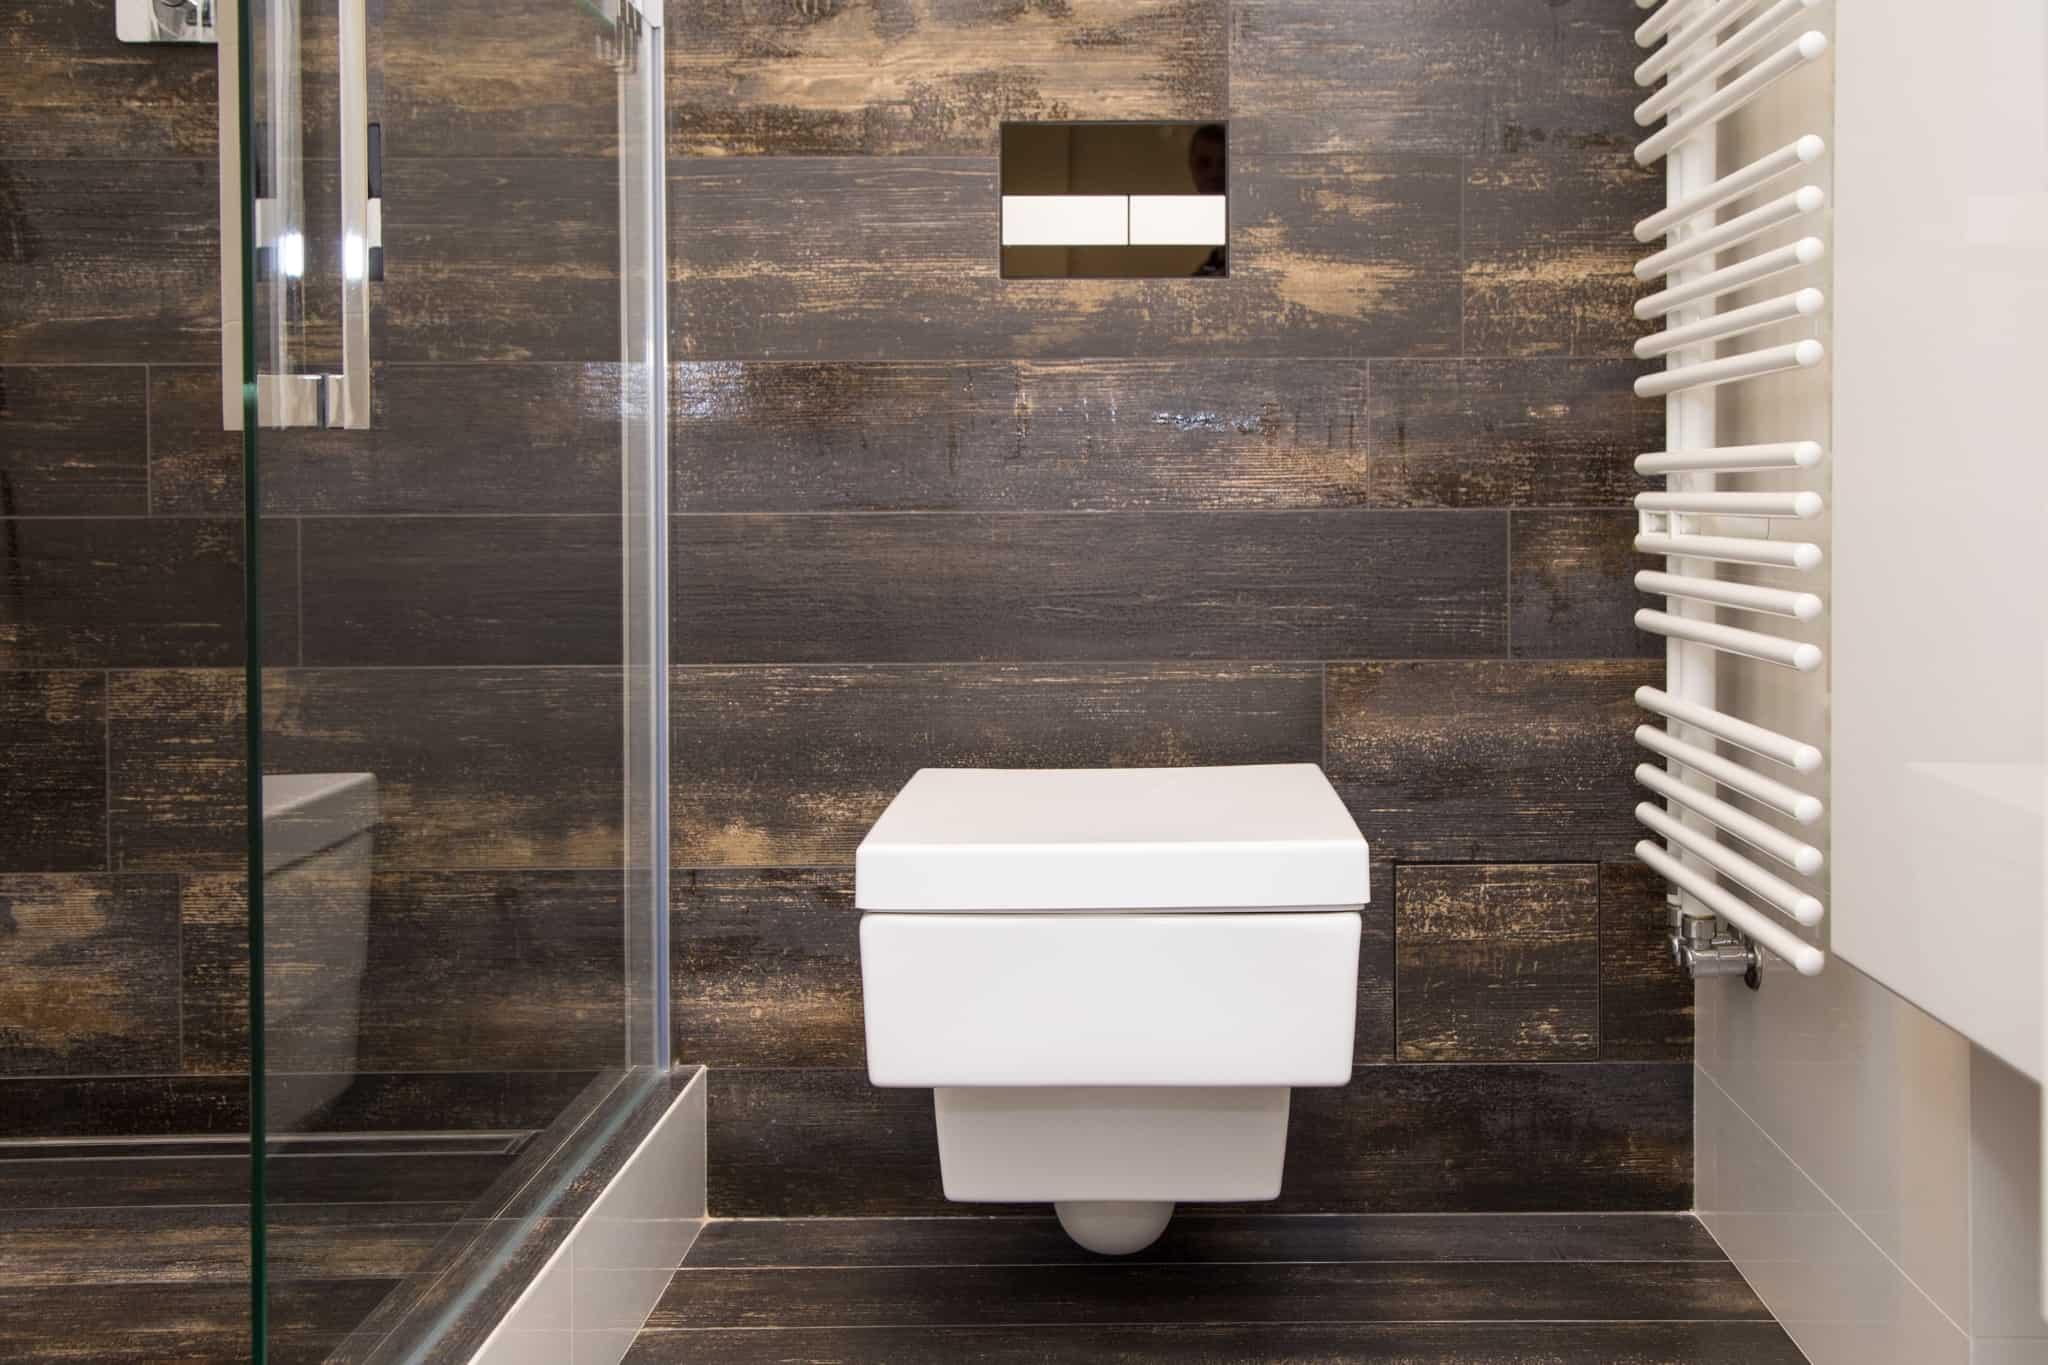 casa de banho compacta com sanita branca